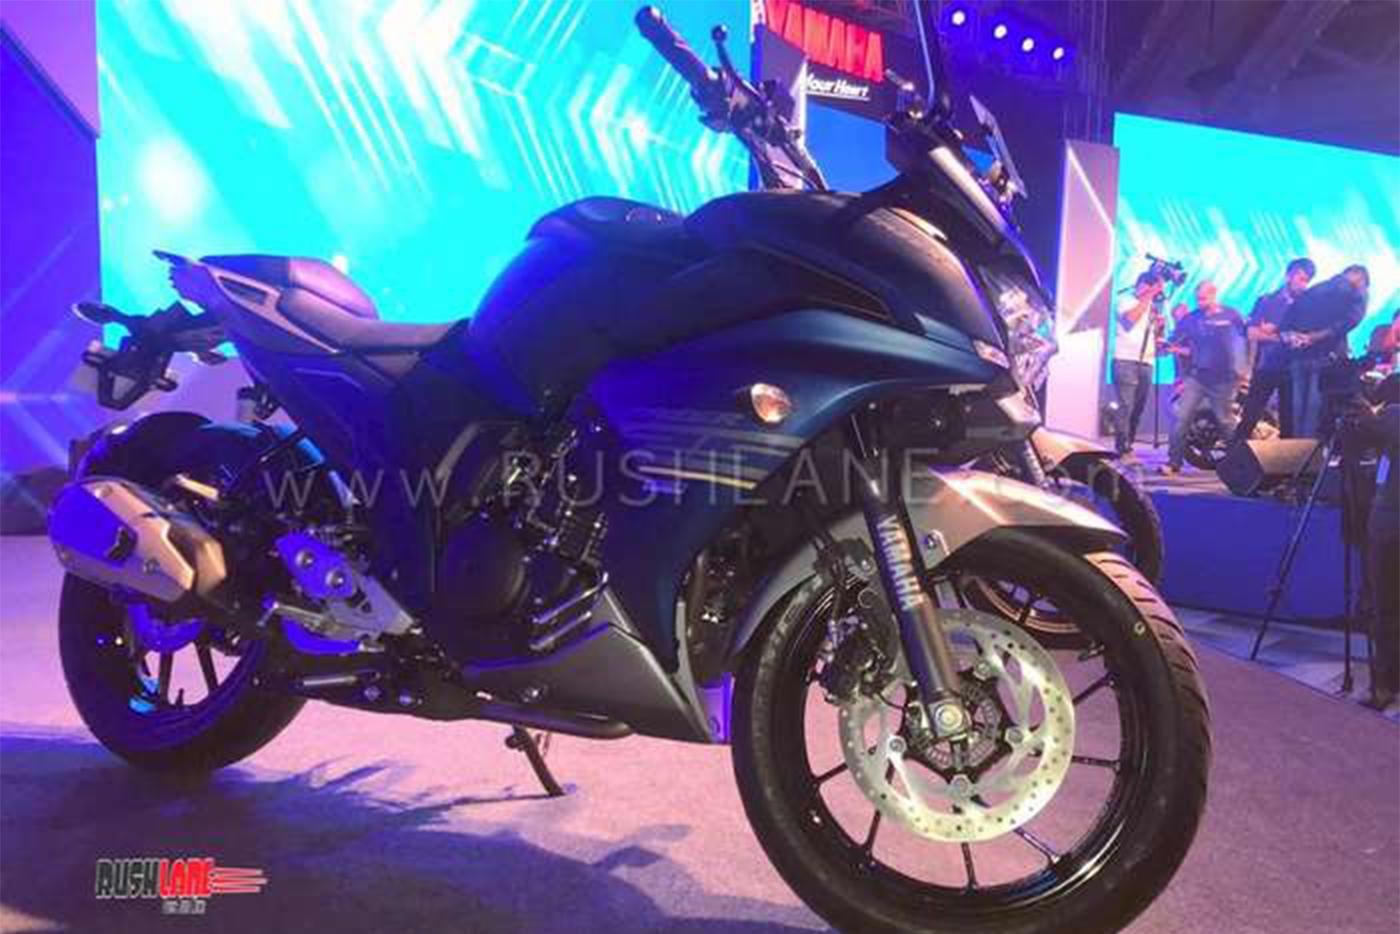 2019-yamaha-fz25-fazer-25-abs-launch-price-india2.jpg